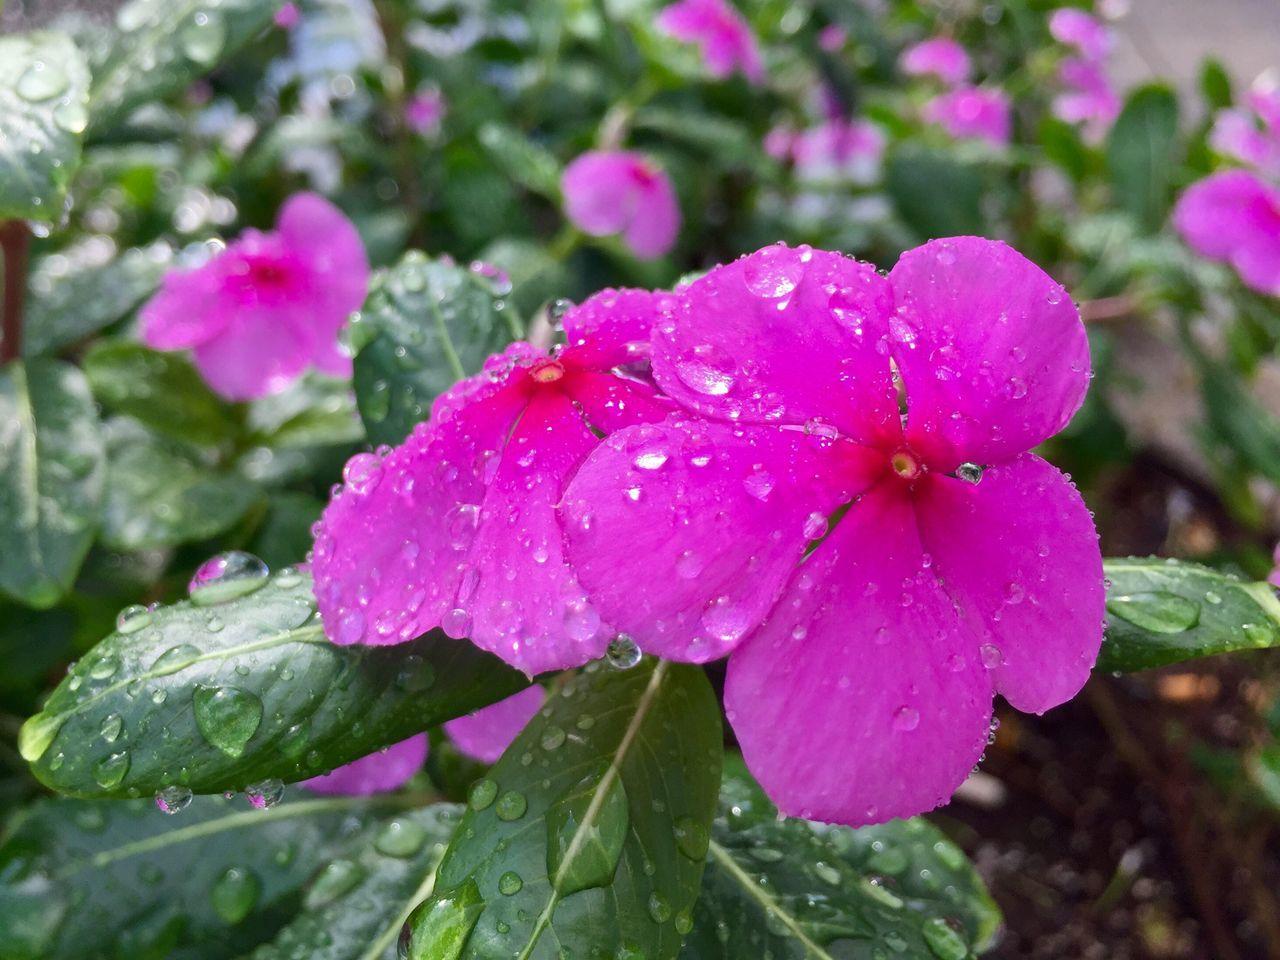 EyeEm Gallery Flowers Drops Getty X EyeEm EyeEm Best Shots Good Morning Hot Weather Cooling  EyeEm Nature Lover